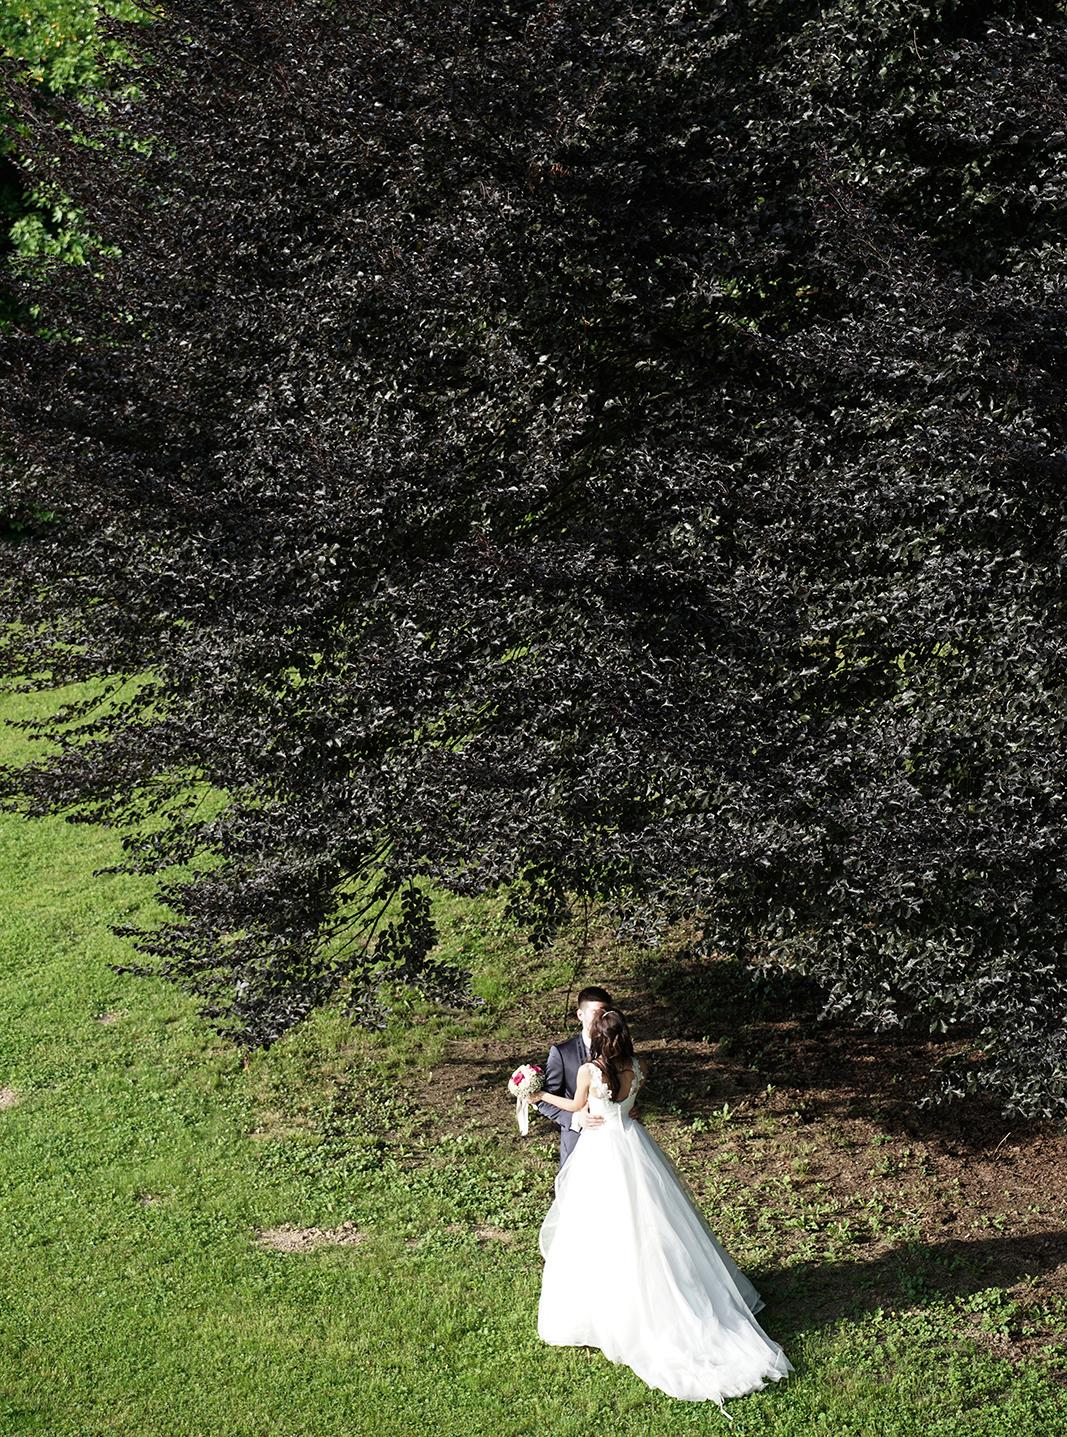 ocation matrimonio Padova , giardino esterno per eventi Vicenza, spazio esterno per eventi Vicenza, giardino esterno matrimonio Vicenza, giardino esterno matrimonio Padova, giardino esterno matrimoni Vicenza